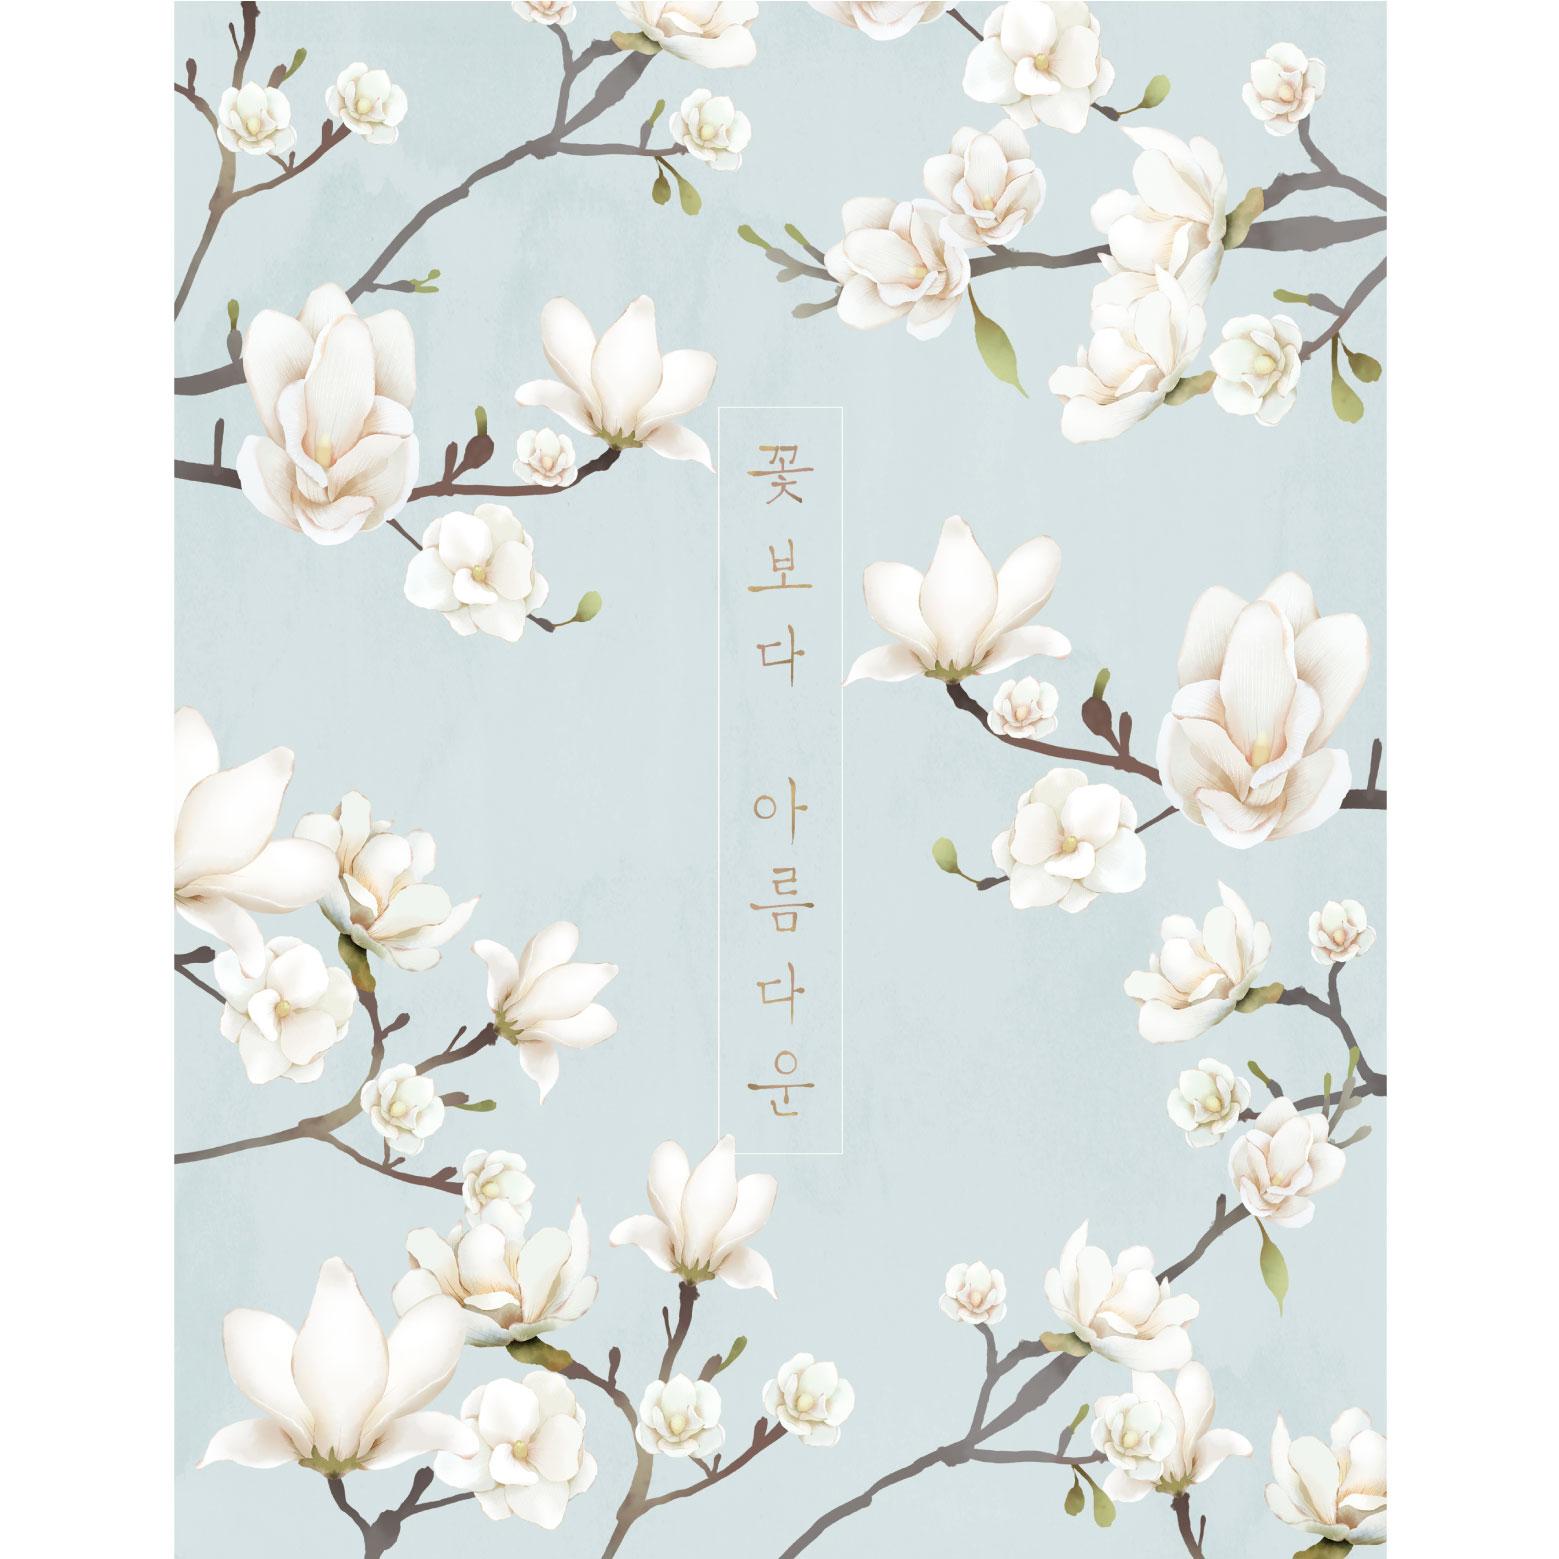 봄배경현수막(목련)-236